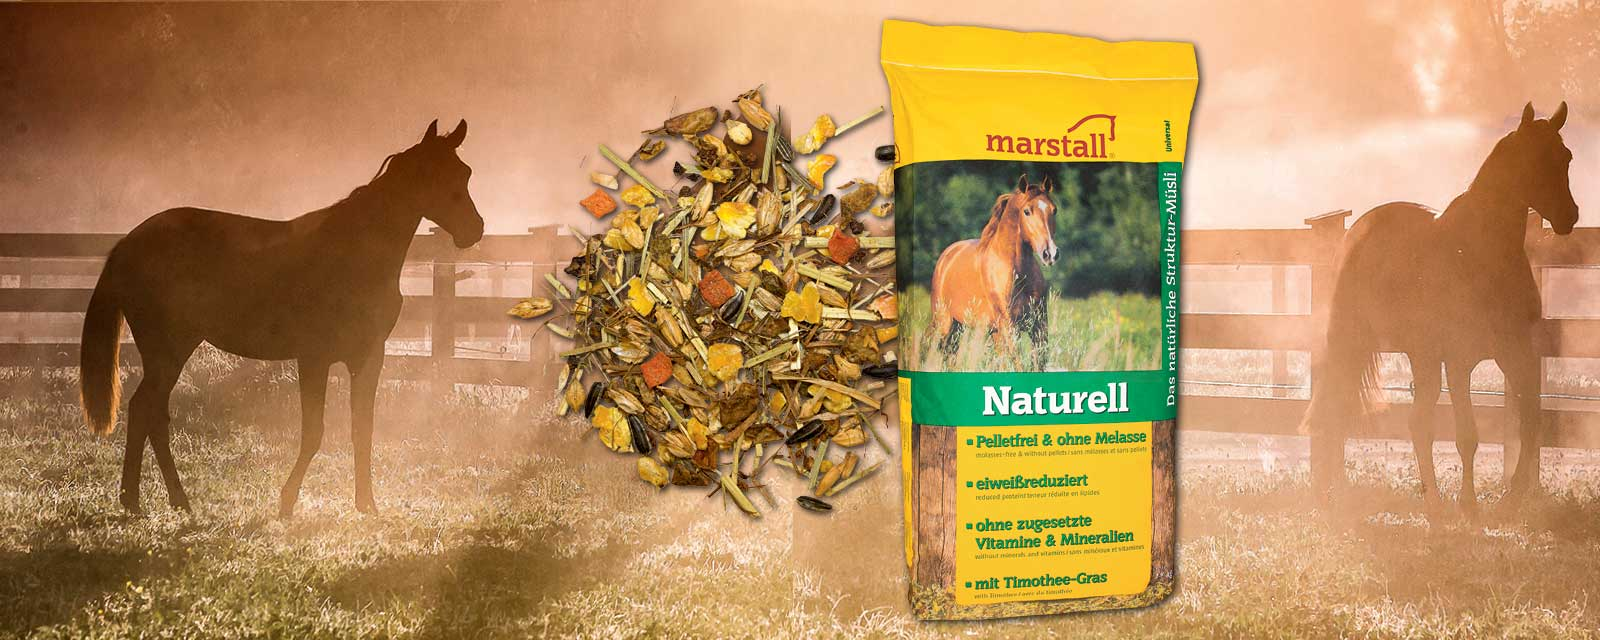 marstall Universal-Linie Naturell